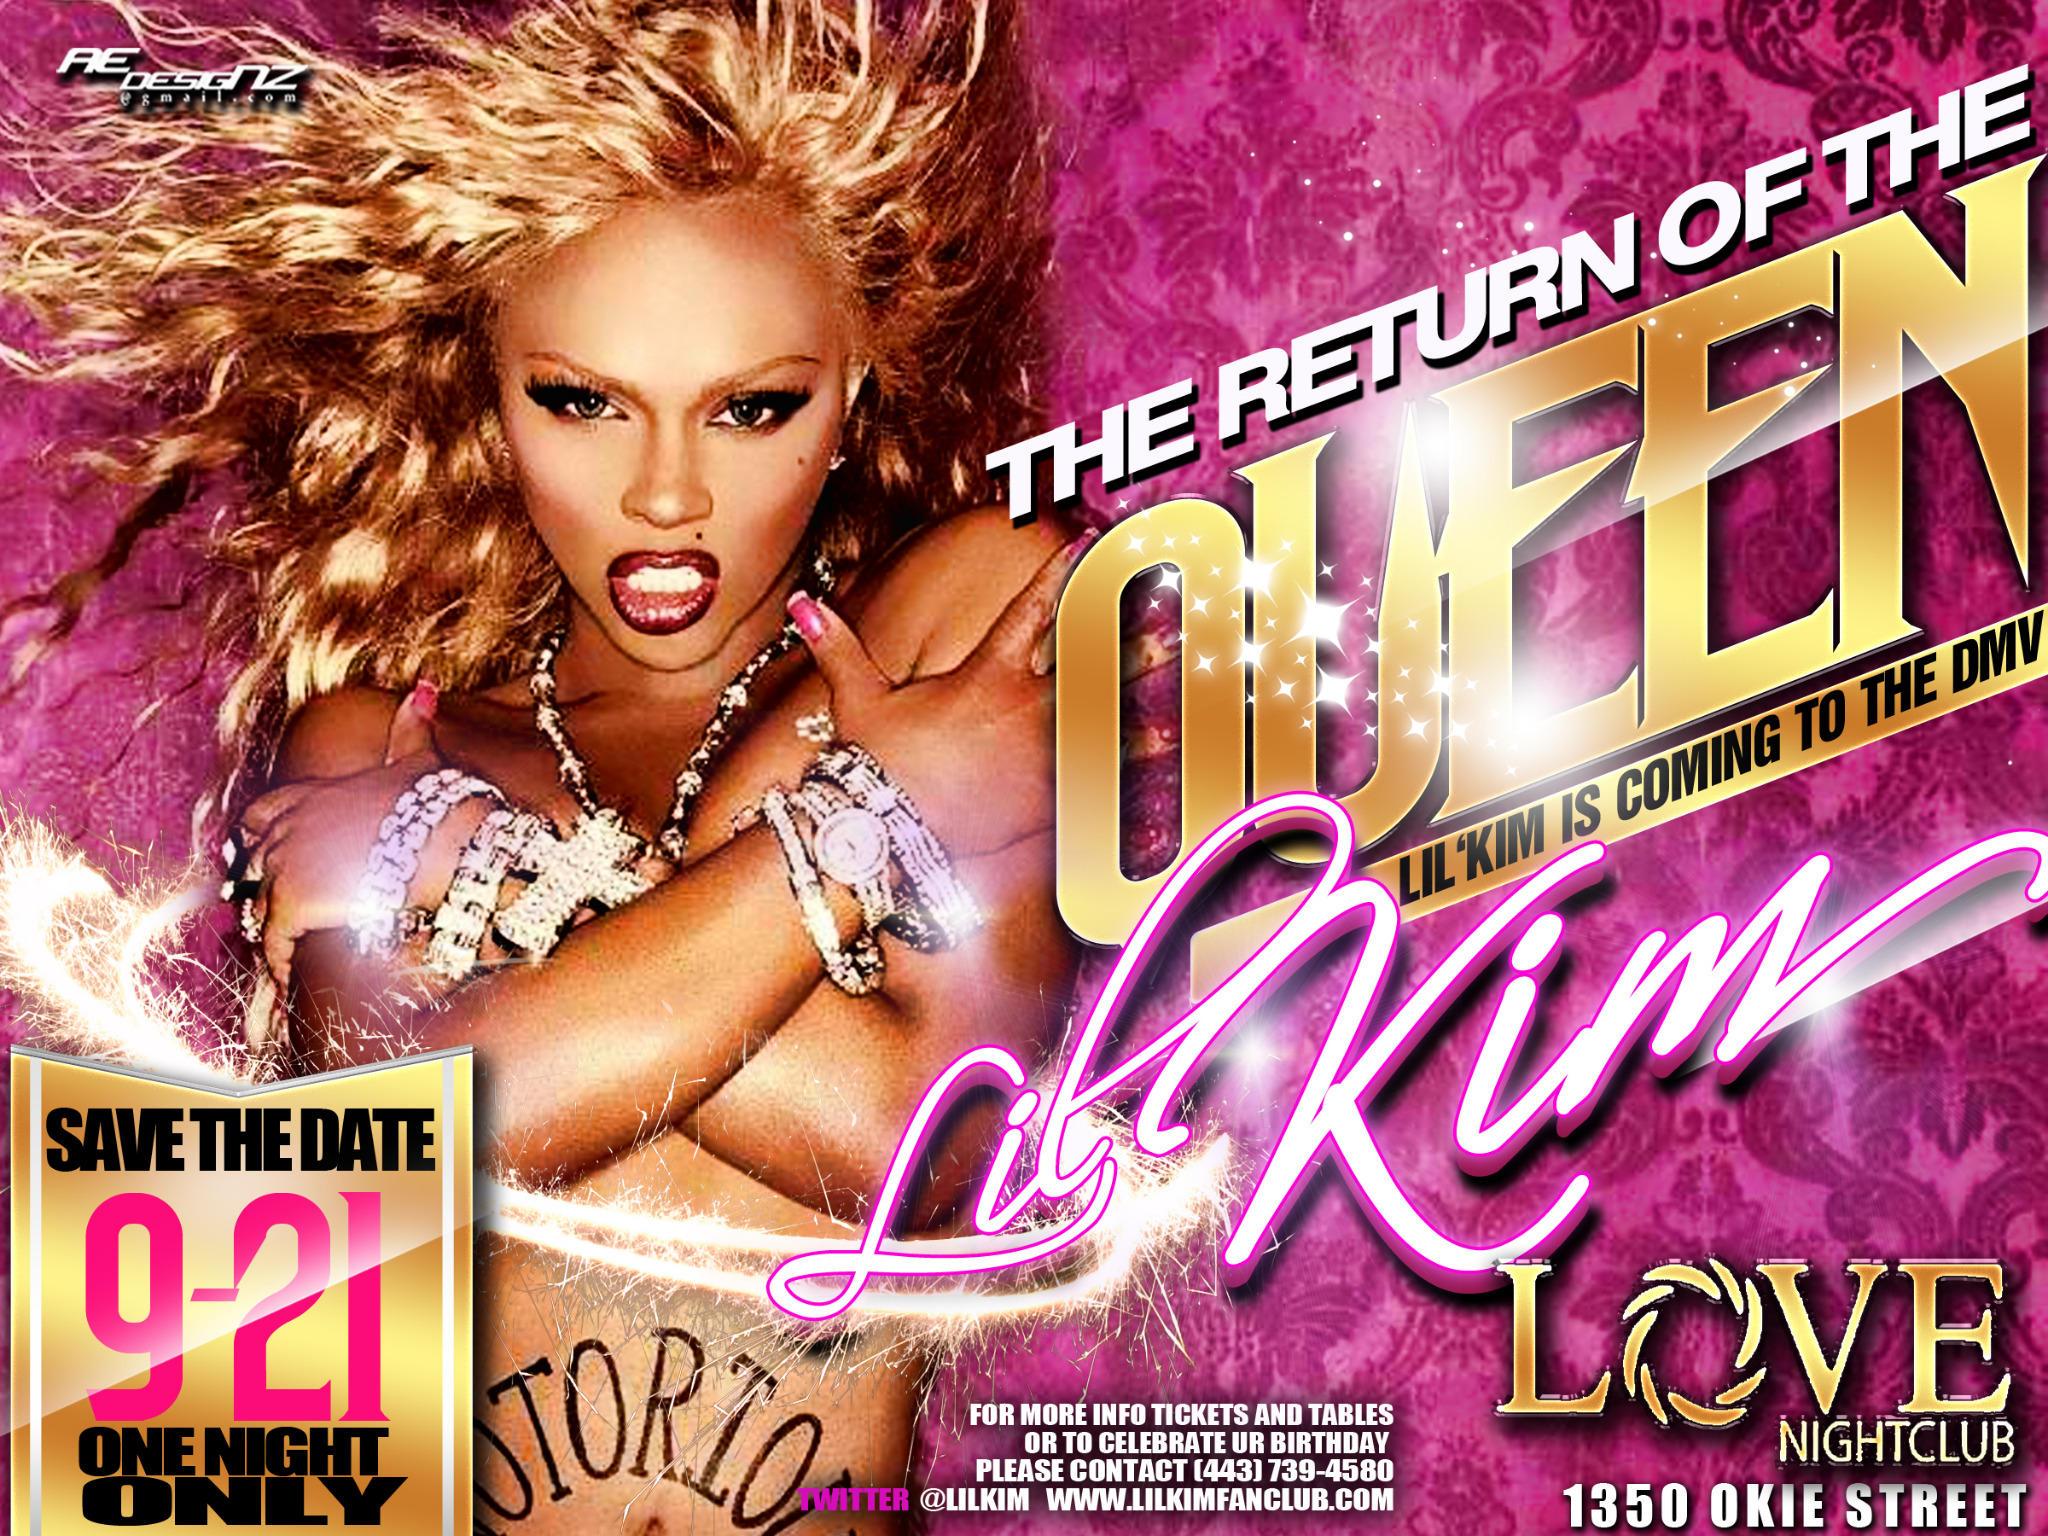 DMV area!!! This Friday night @ LOVE nightclub!!! http://t.co/aV1FaGzX